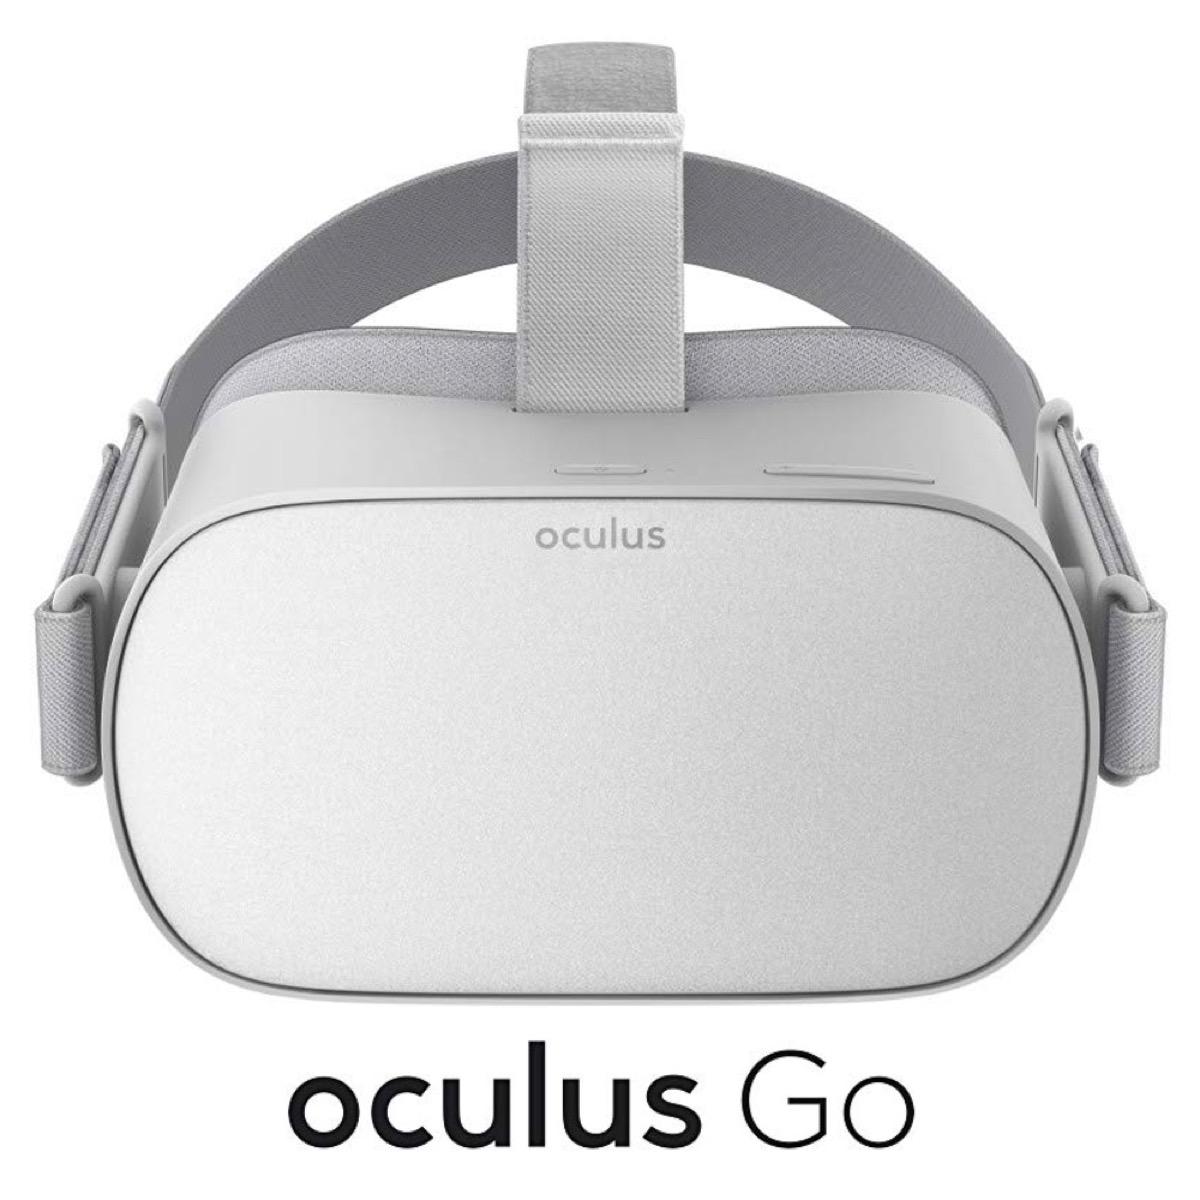 Oculus Go 64GB オキュラスゴー VR ヘッドセット 本体 コントローラー セット PC不要 ゲーム 映画 動画 並行輸入品 (SN)